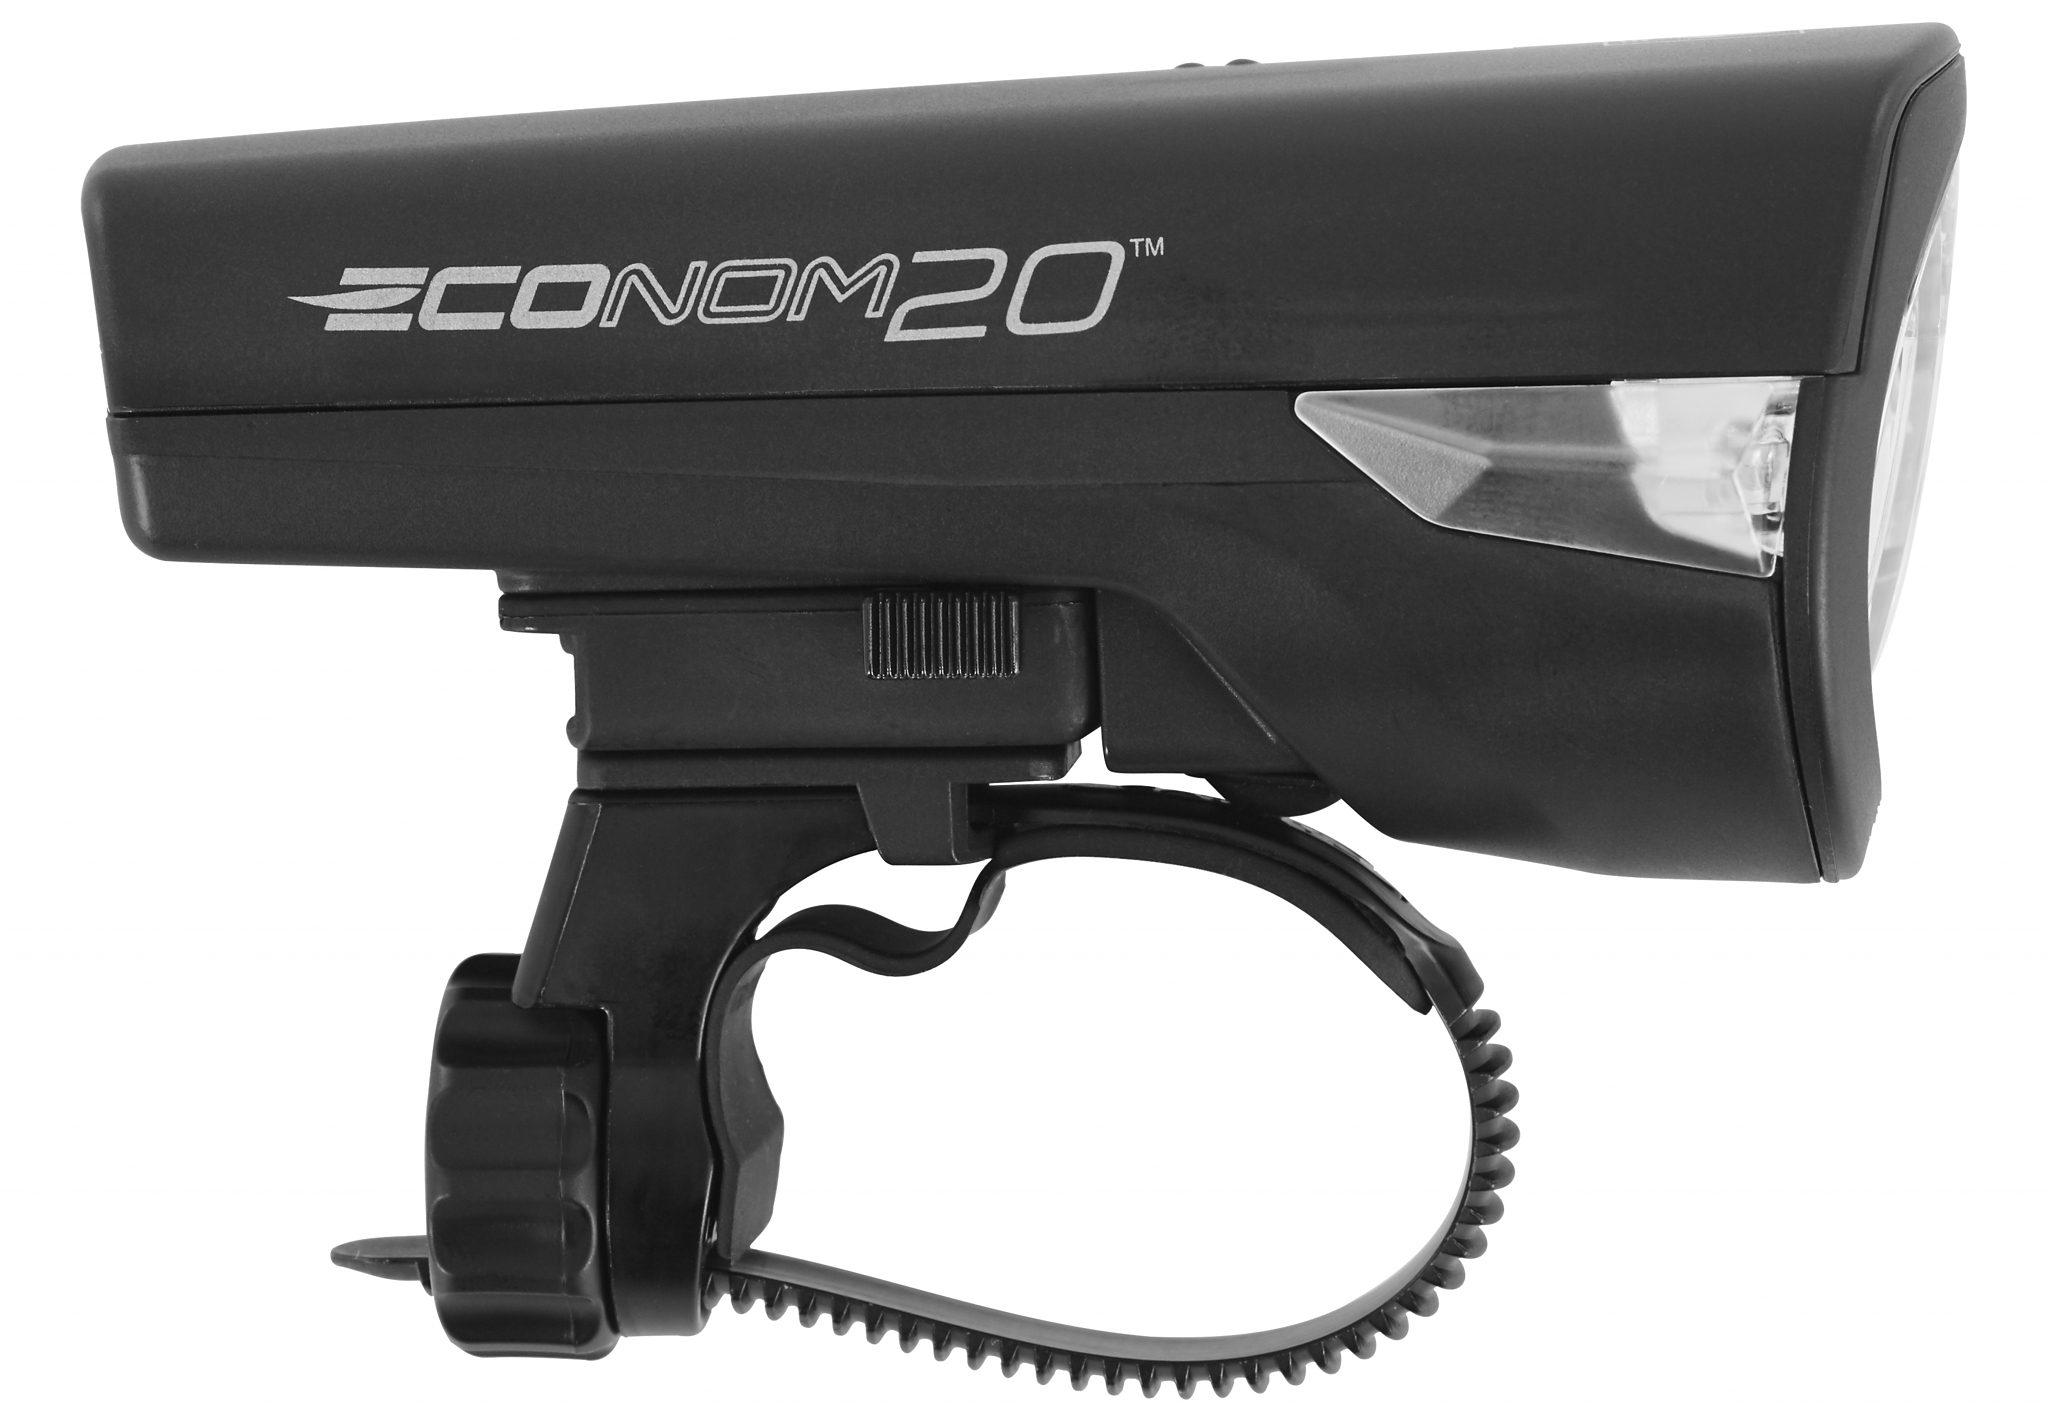 CatEye Fahrradbeleuchtung »Econom 20 HL-EL345G«